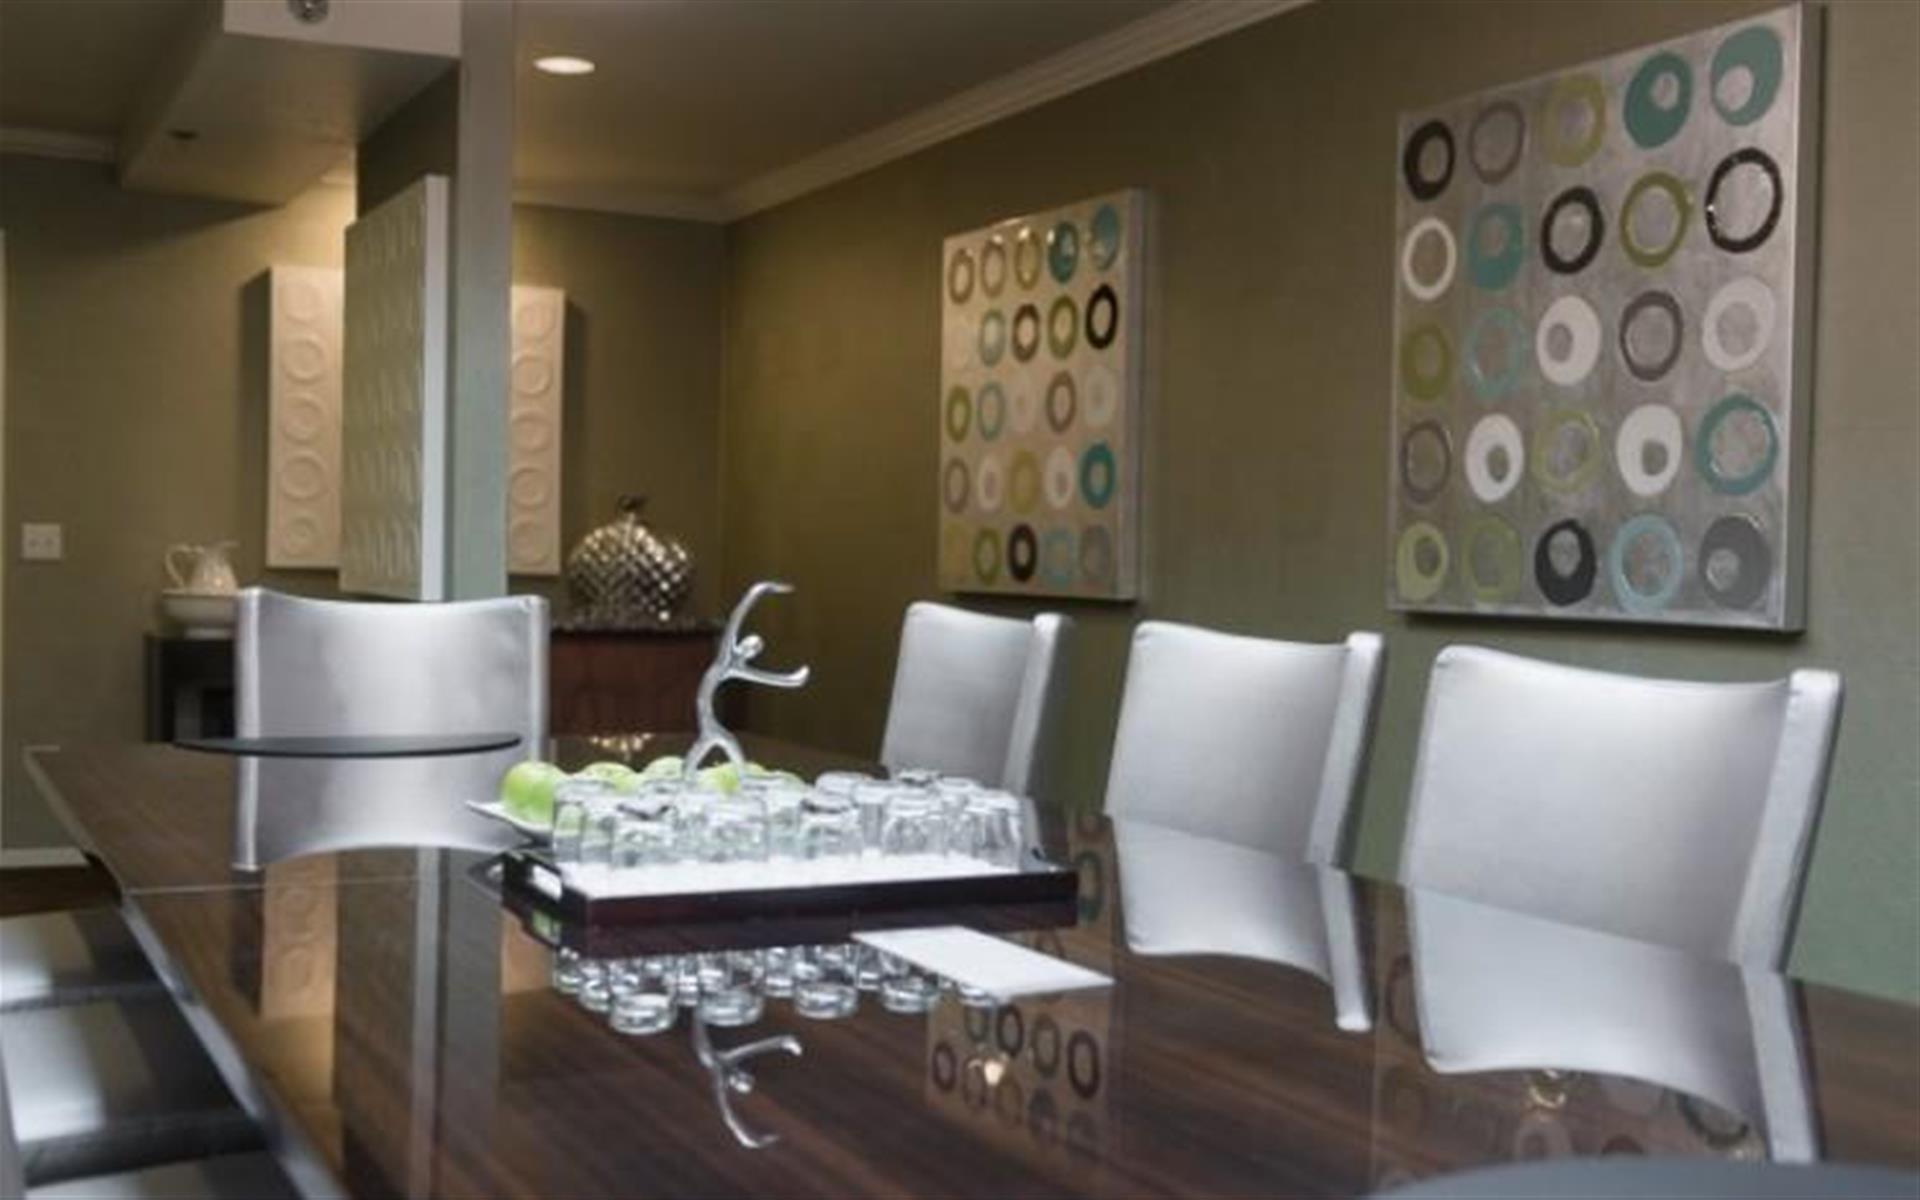 Best Western PLUS Novato Oaks Inn - The Linden Room